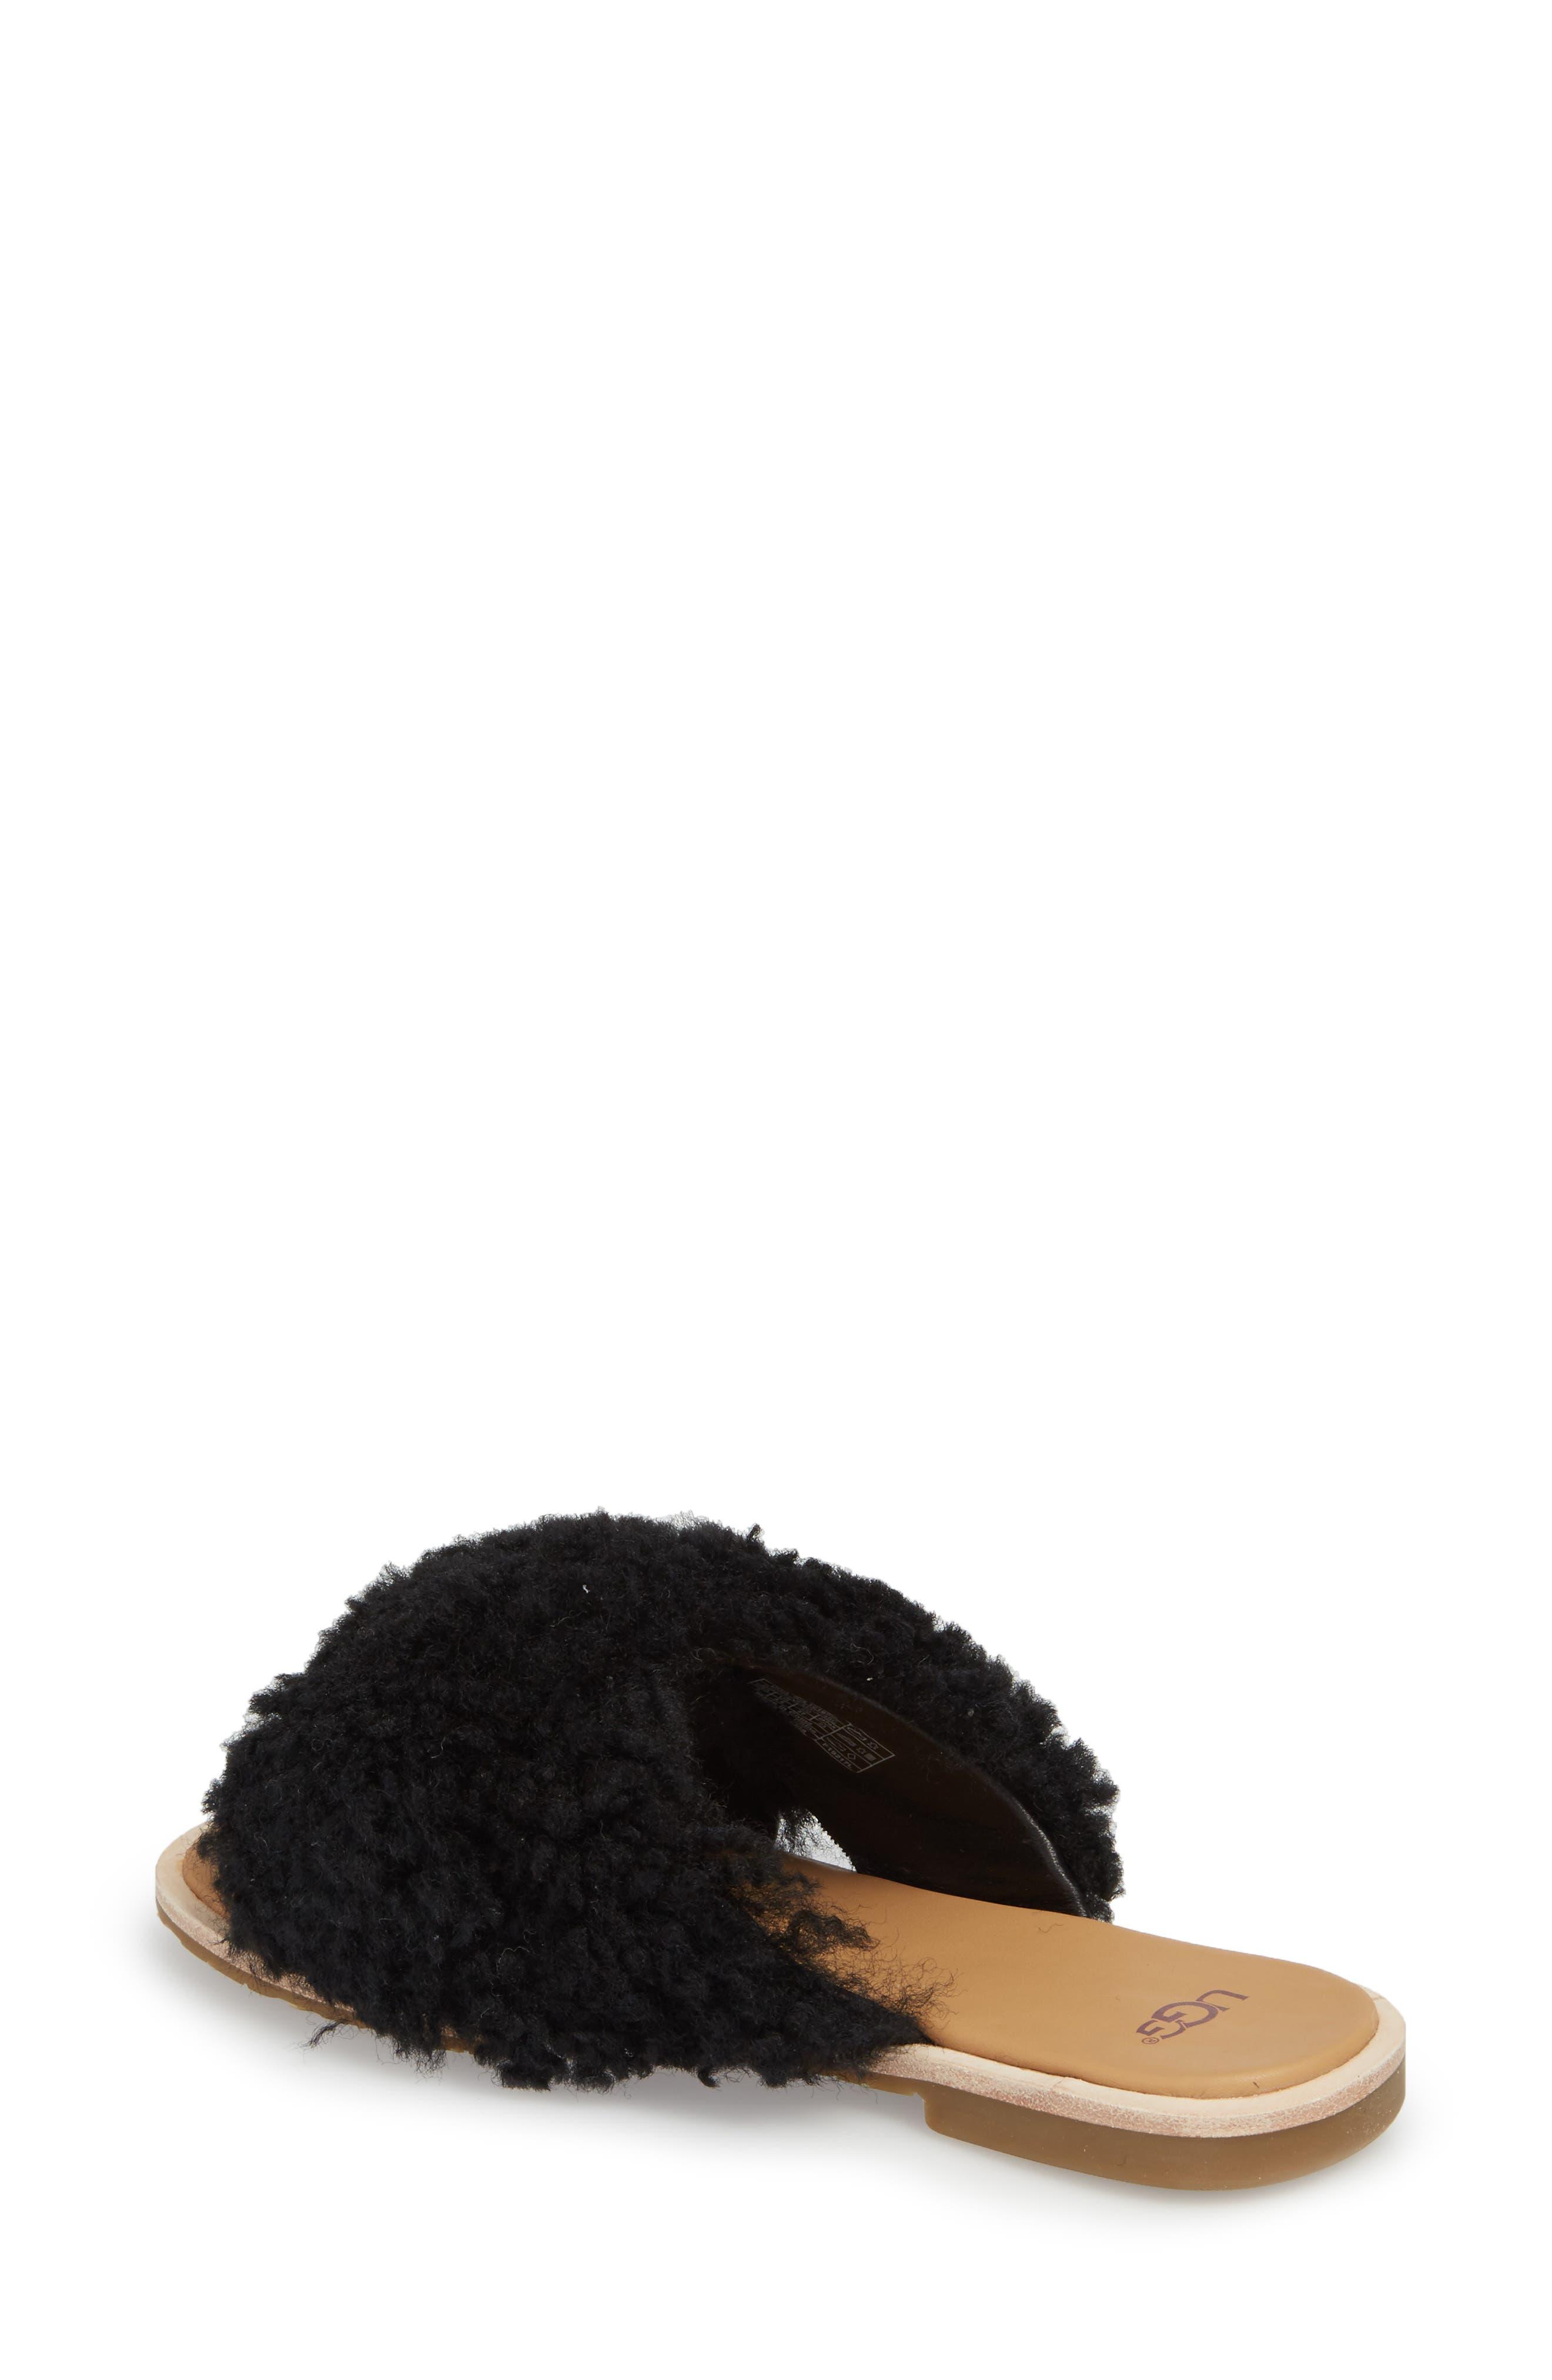 Joni Genuine Shearling Slide Sandal,                             Alternate thumbnail 2, color,                             BLACK